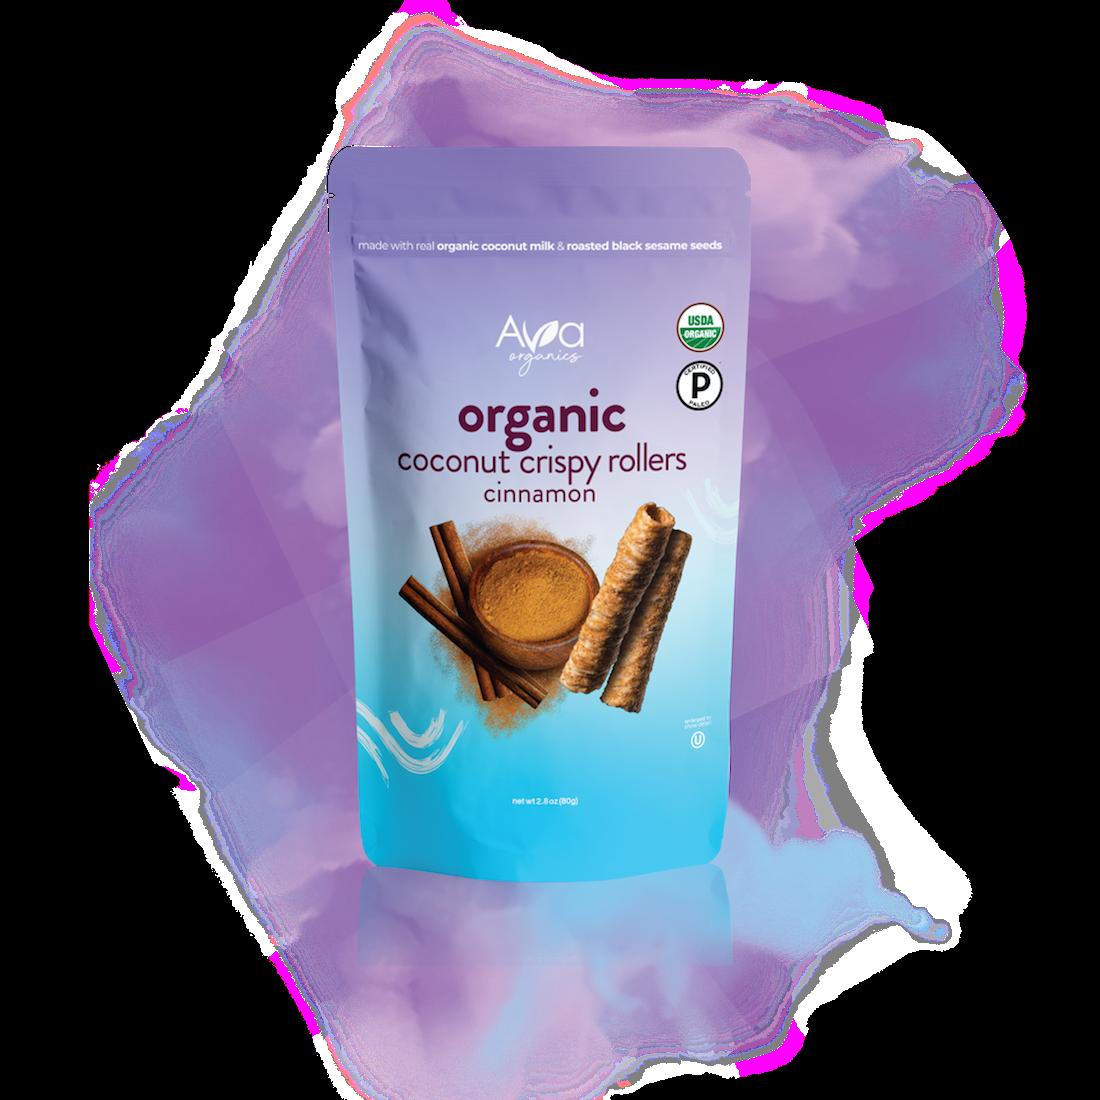 Coconut Crispy Rollers - Cinnamon - Ava Organics - Certified Paleo by the Paleo Foundation